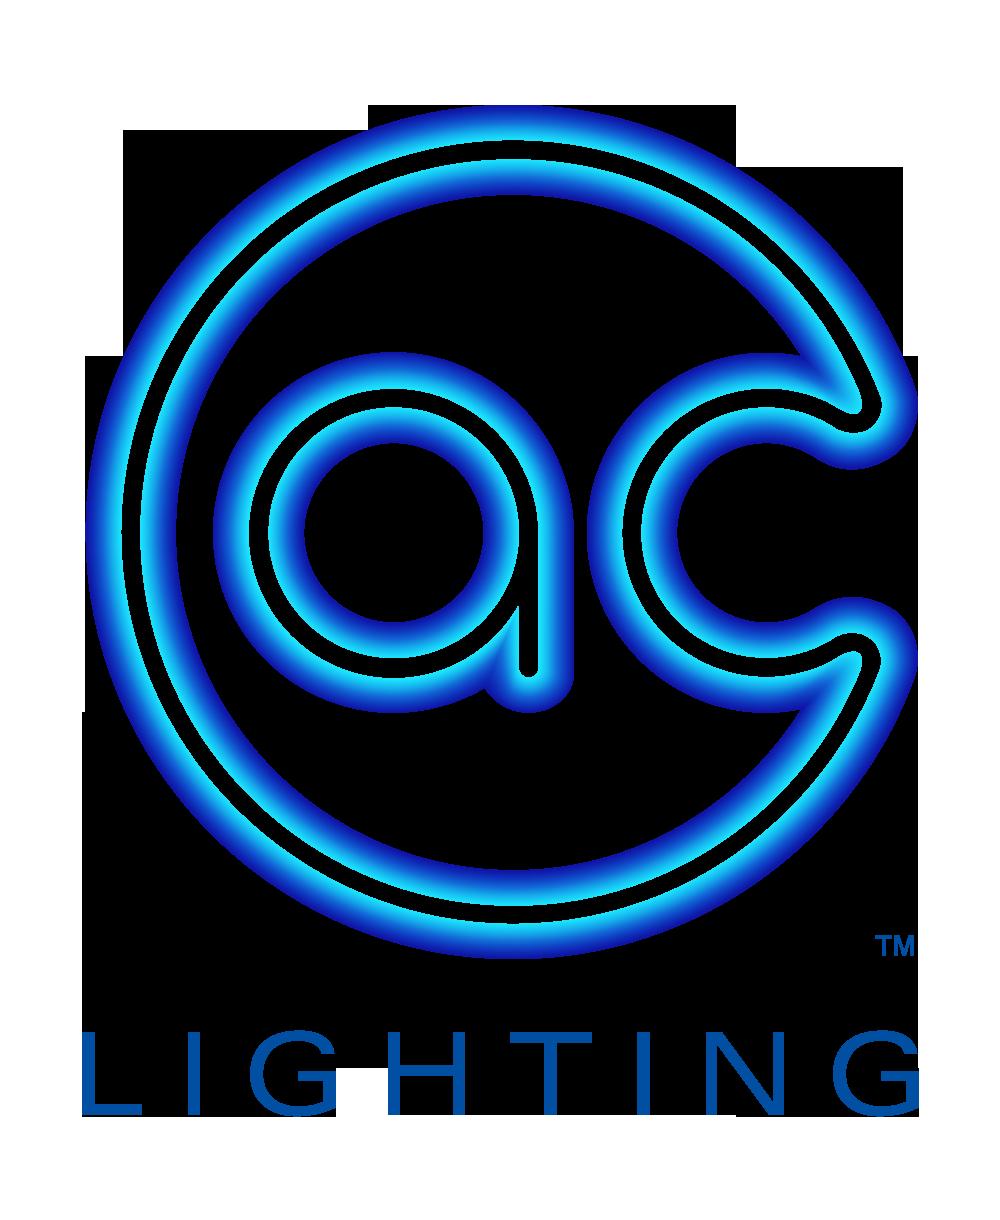 A.C. Lighting